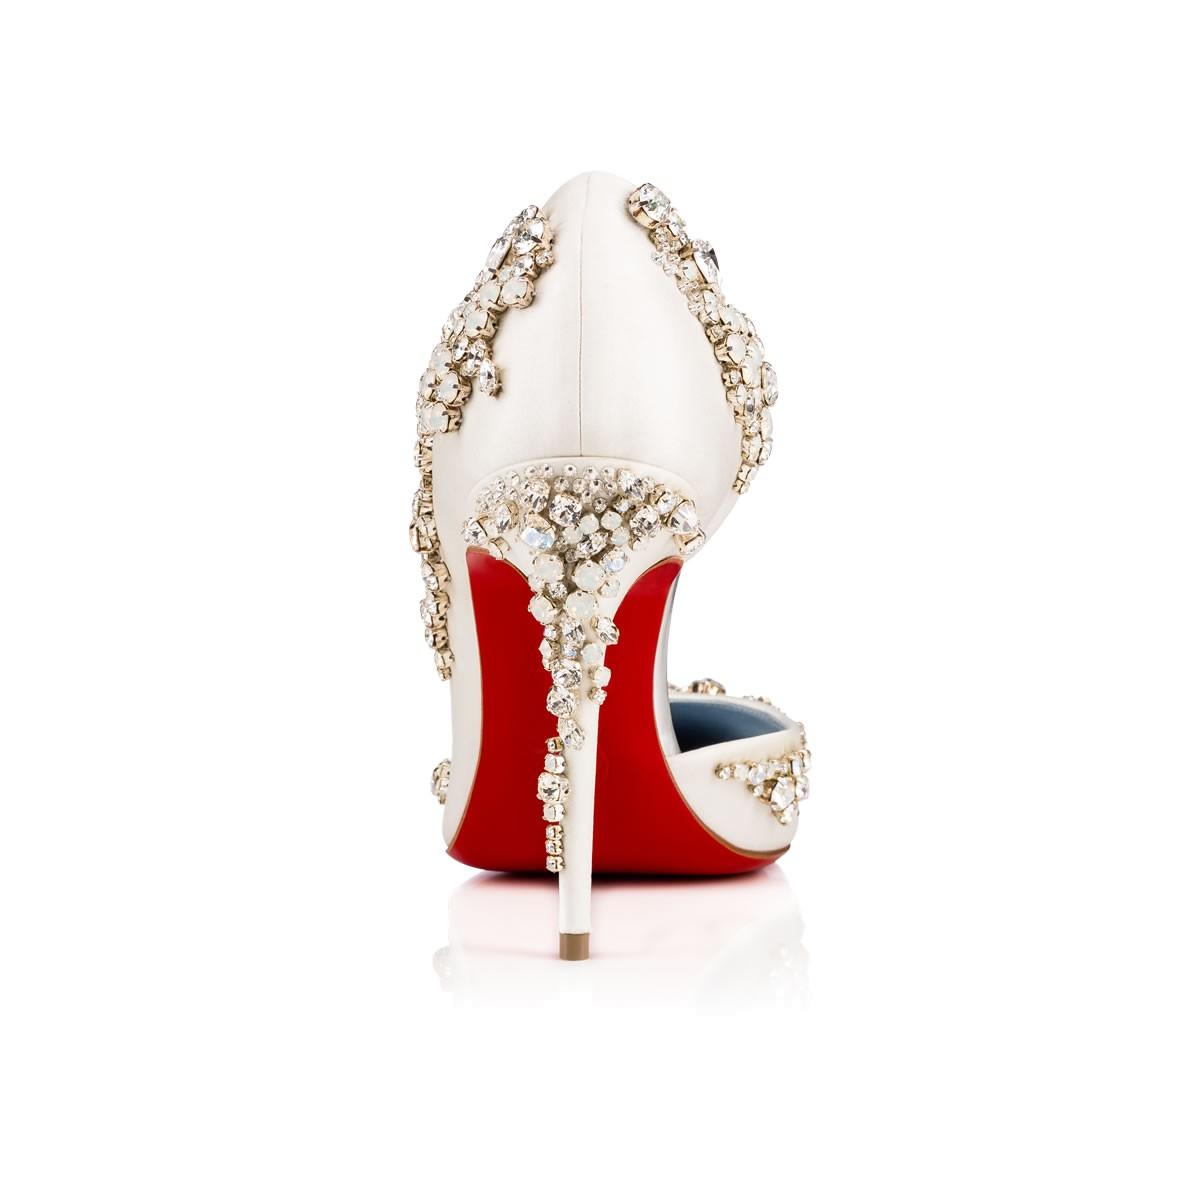 Shoes - Brodiriza - Christian Louboutin